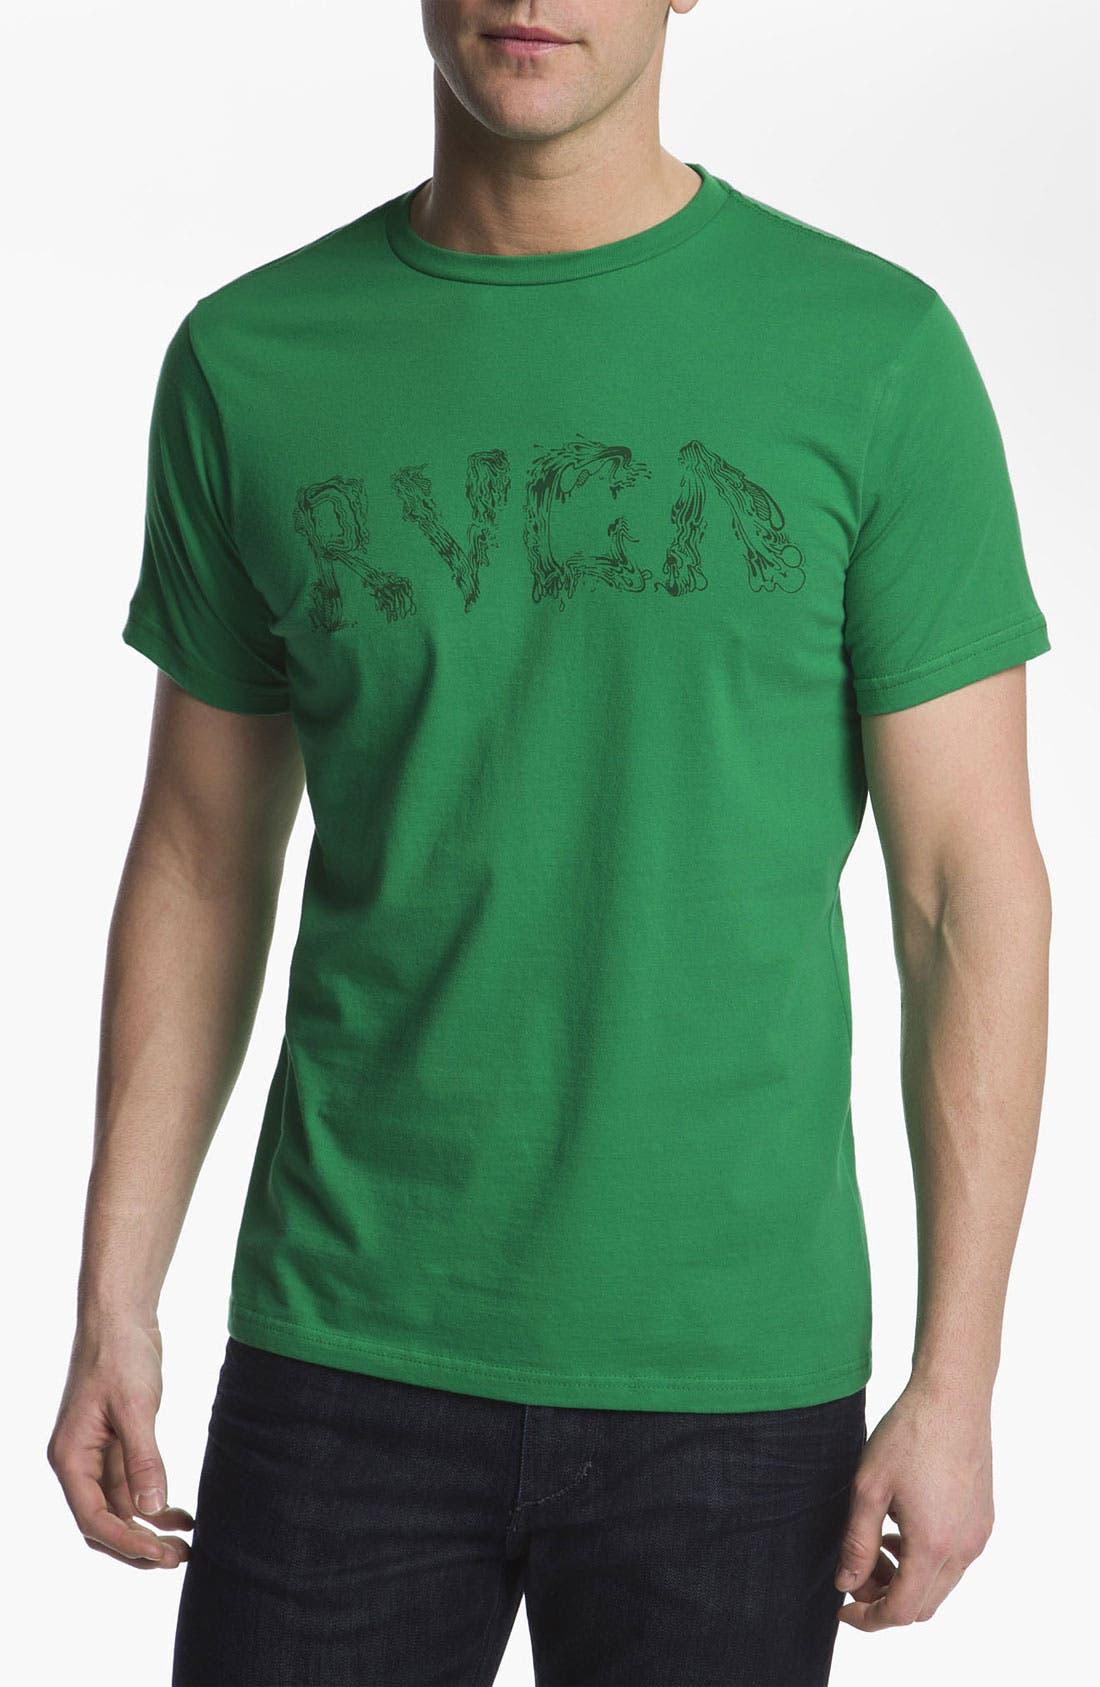 Alternate Image 1 Selected - RVCA 'Goo' T-Shirt